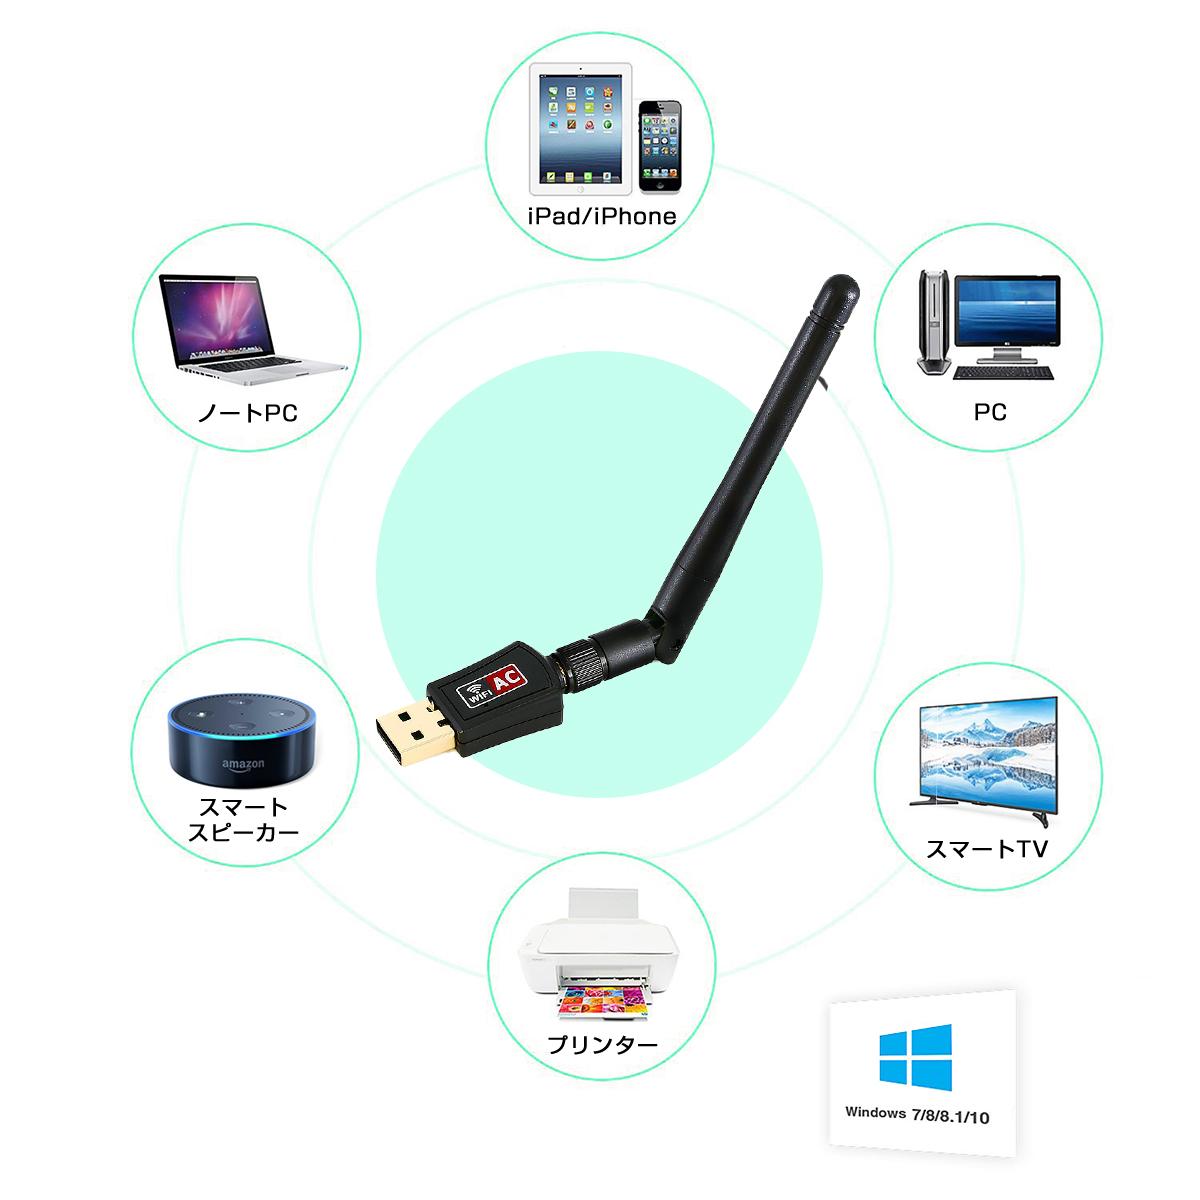 wifi usb 無線lan 子機 親機 アダプタ ハイパワーアンテナ デュアルバンド 2.4GHz 150Mbps/5GHz 433Mbps対応 Windows Mac Linux 対応 1ヶ月保証 K&M